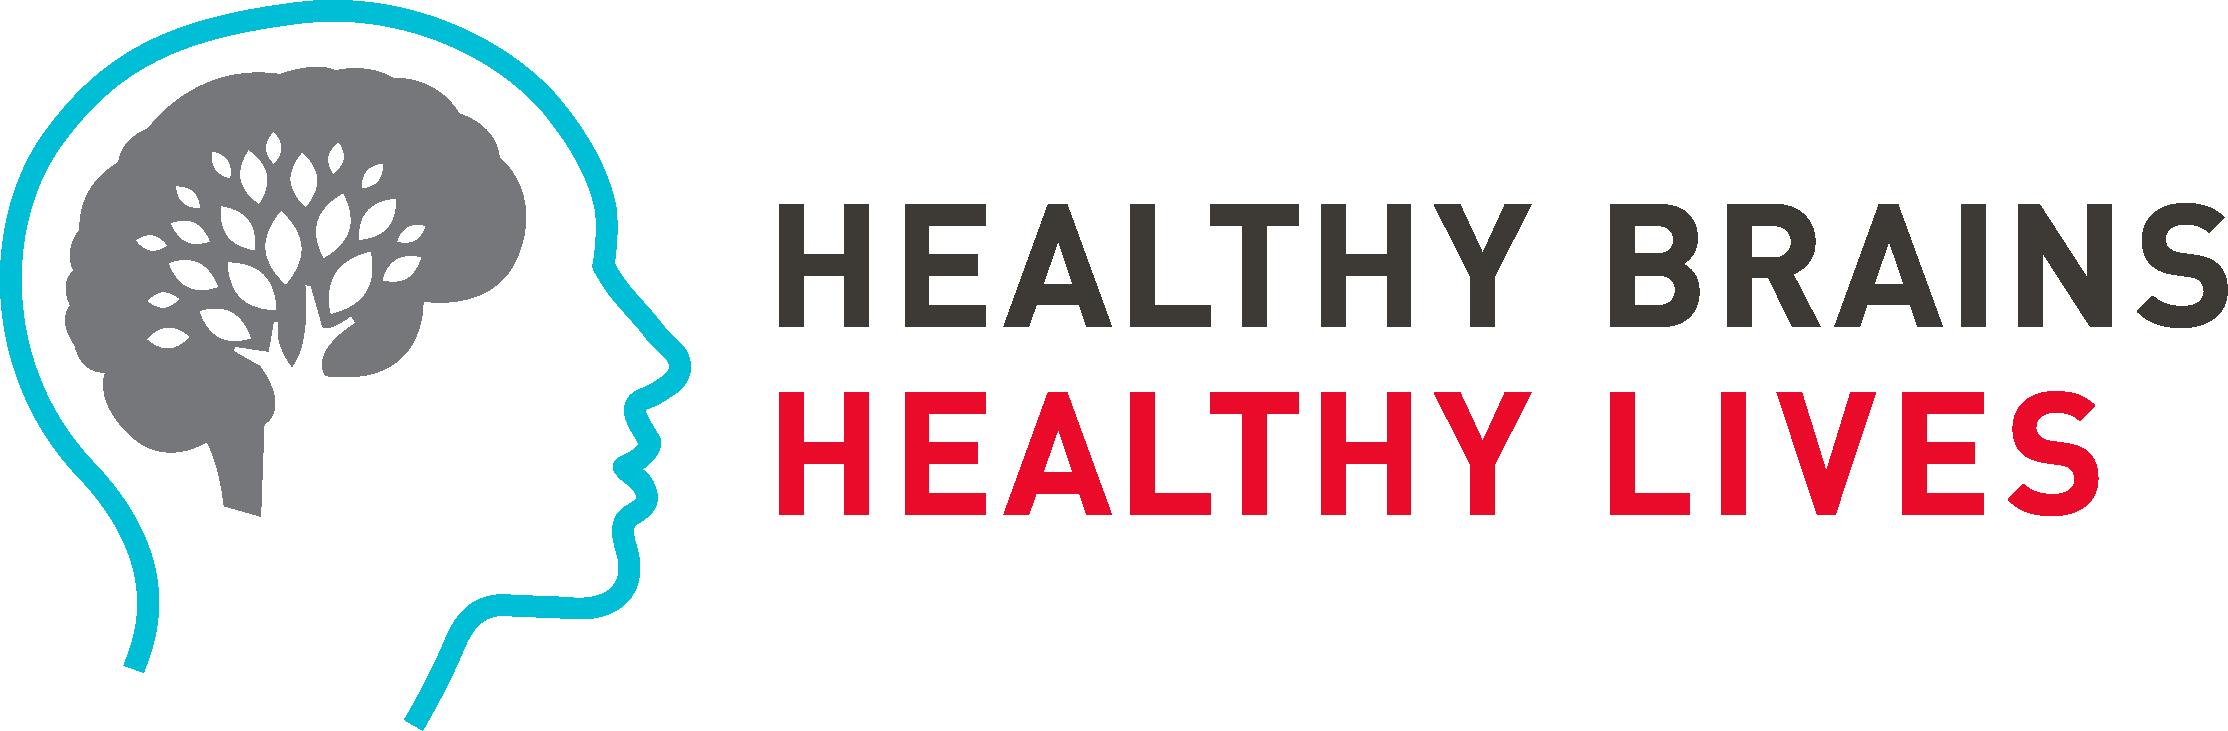 Healthy Brains Healthy Lives logo